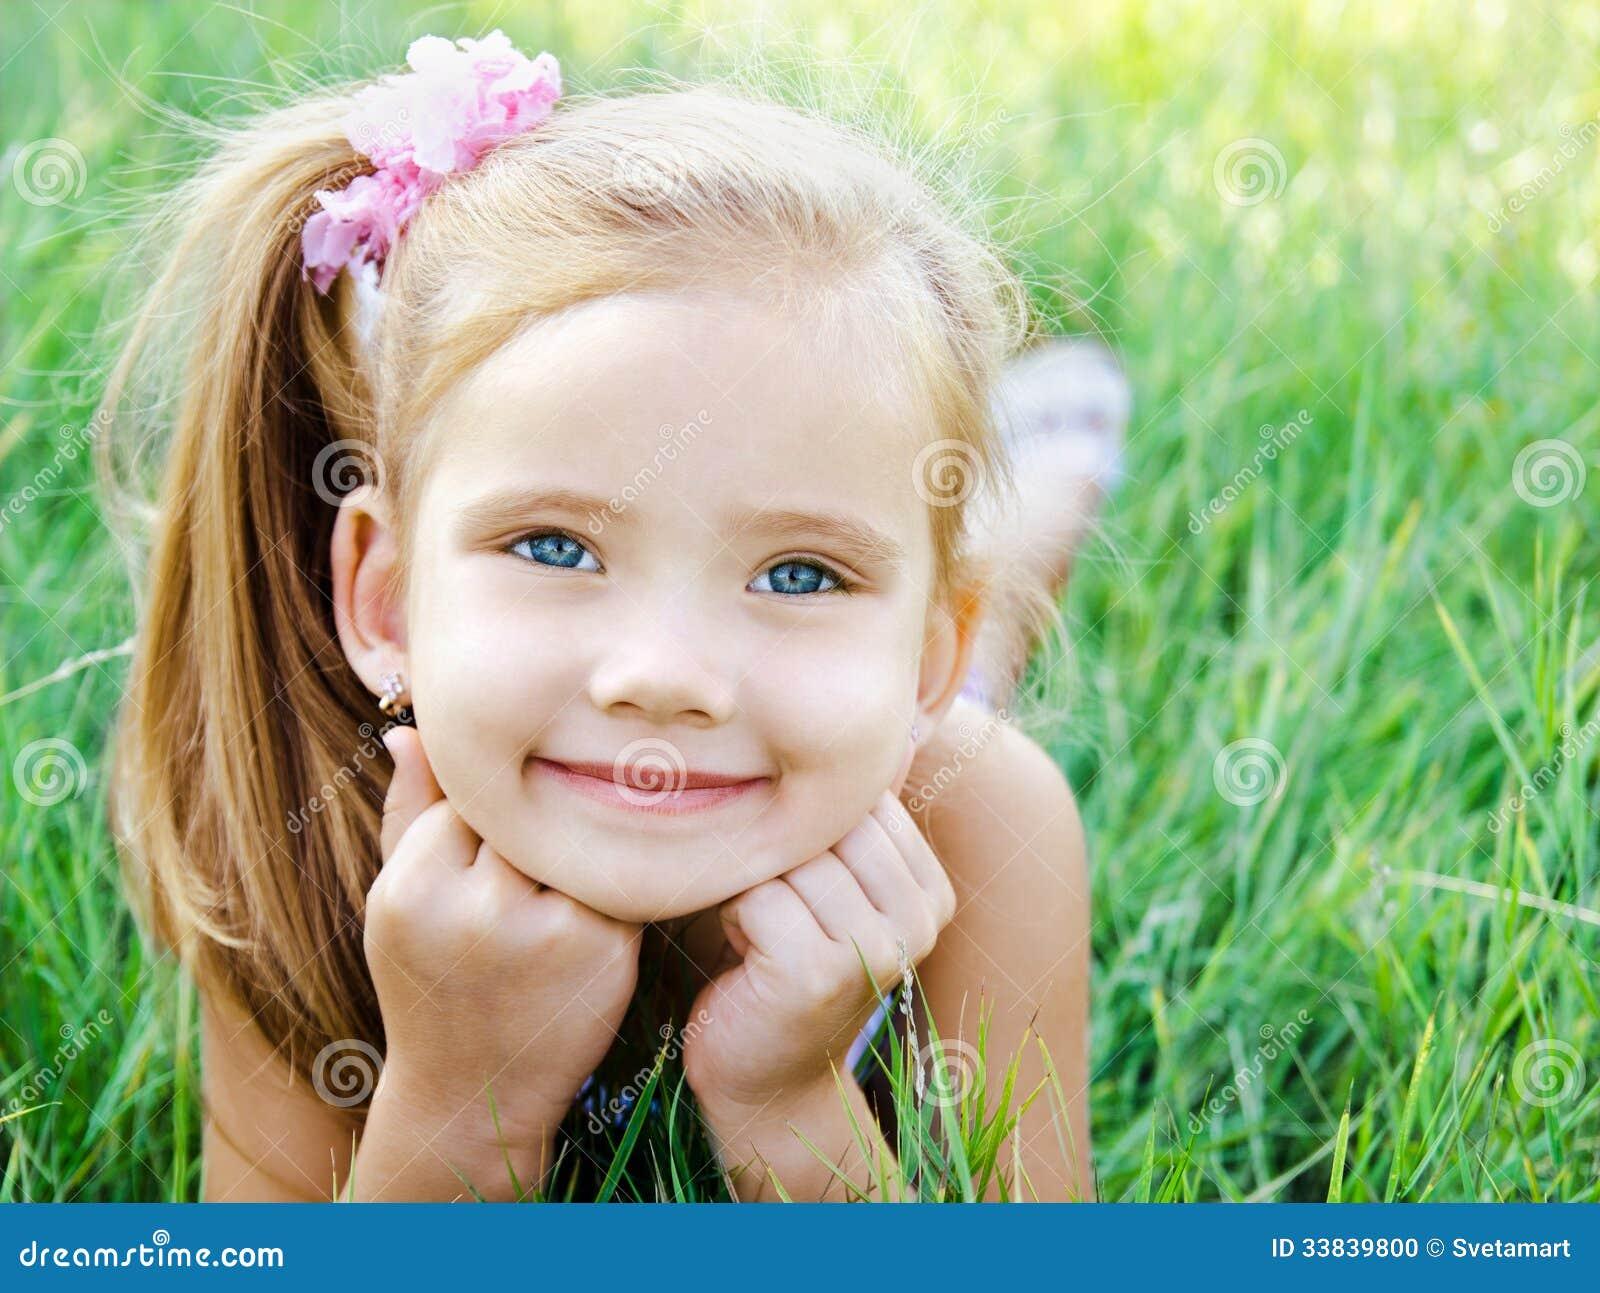 sweet-cute-naked-young-girls-hot-afghan-girl